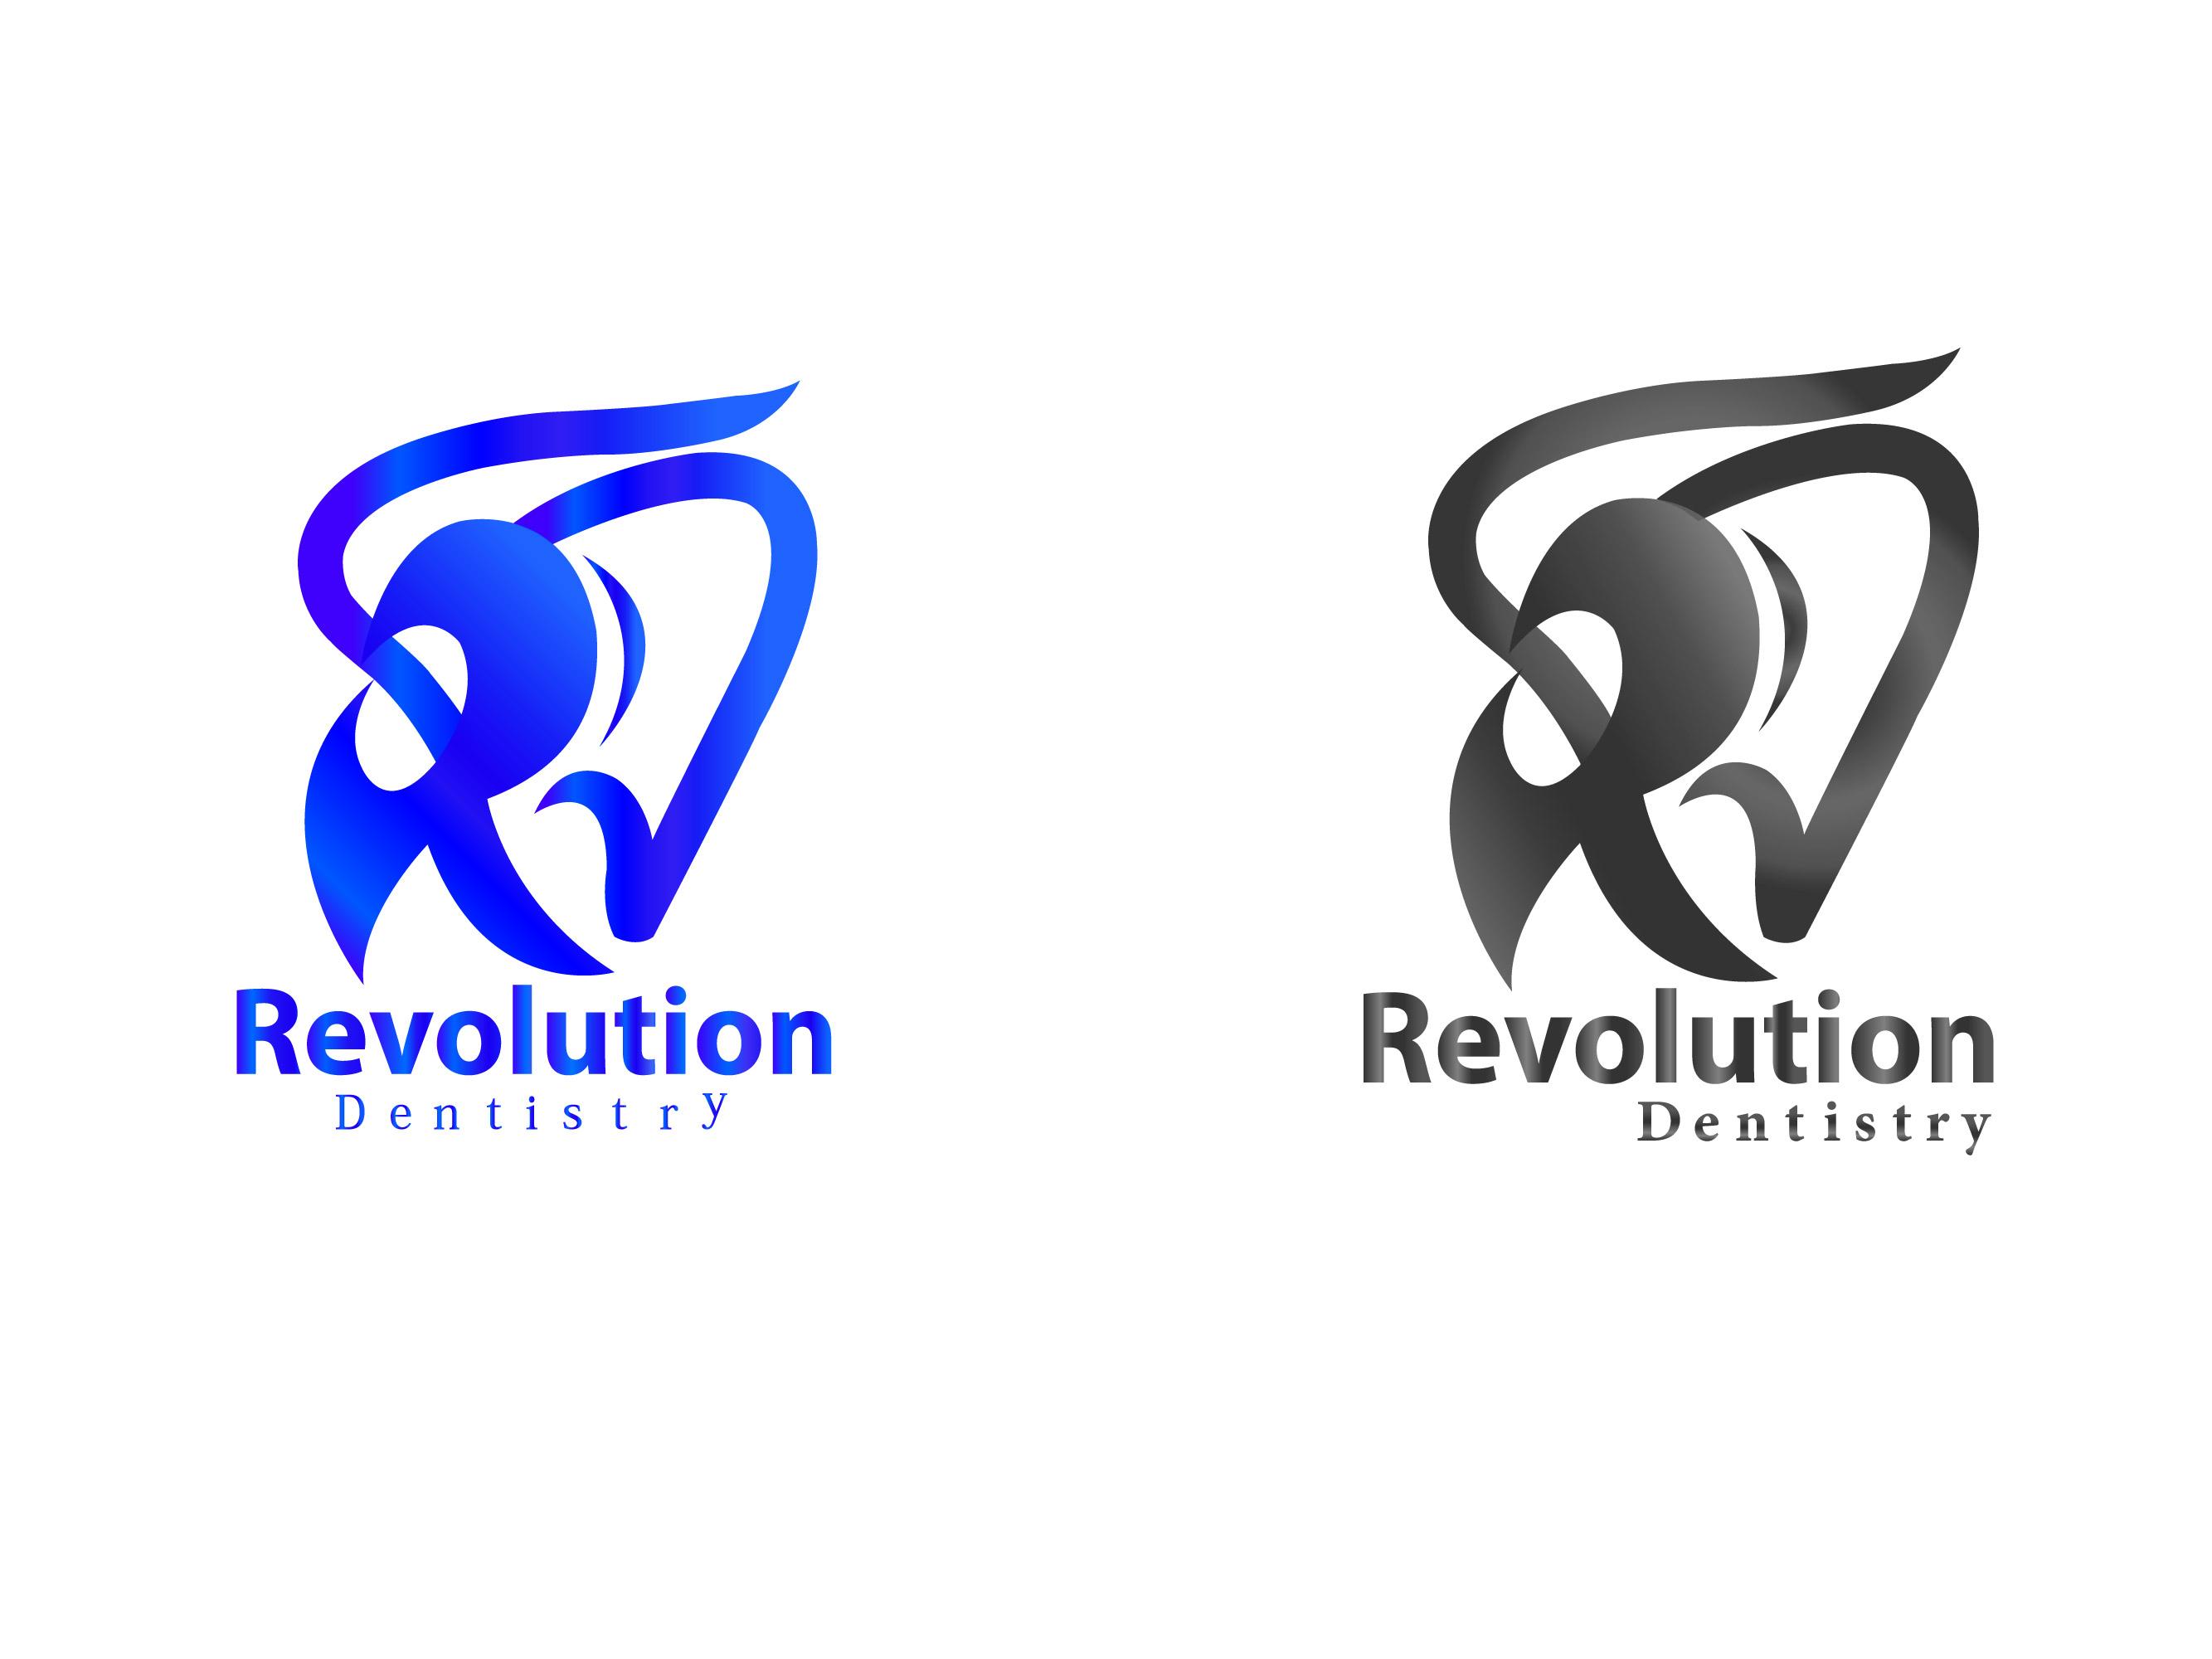 Logo Design by Kishor Patil - Entry No. 86 in the Logo Design Contest Artistic Logo Design for Revolution Dentistry.